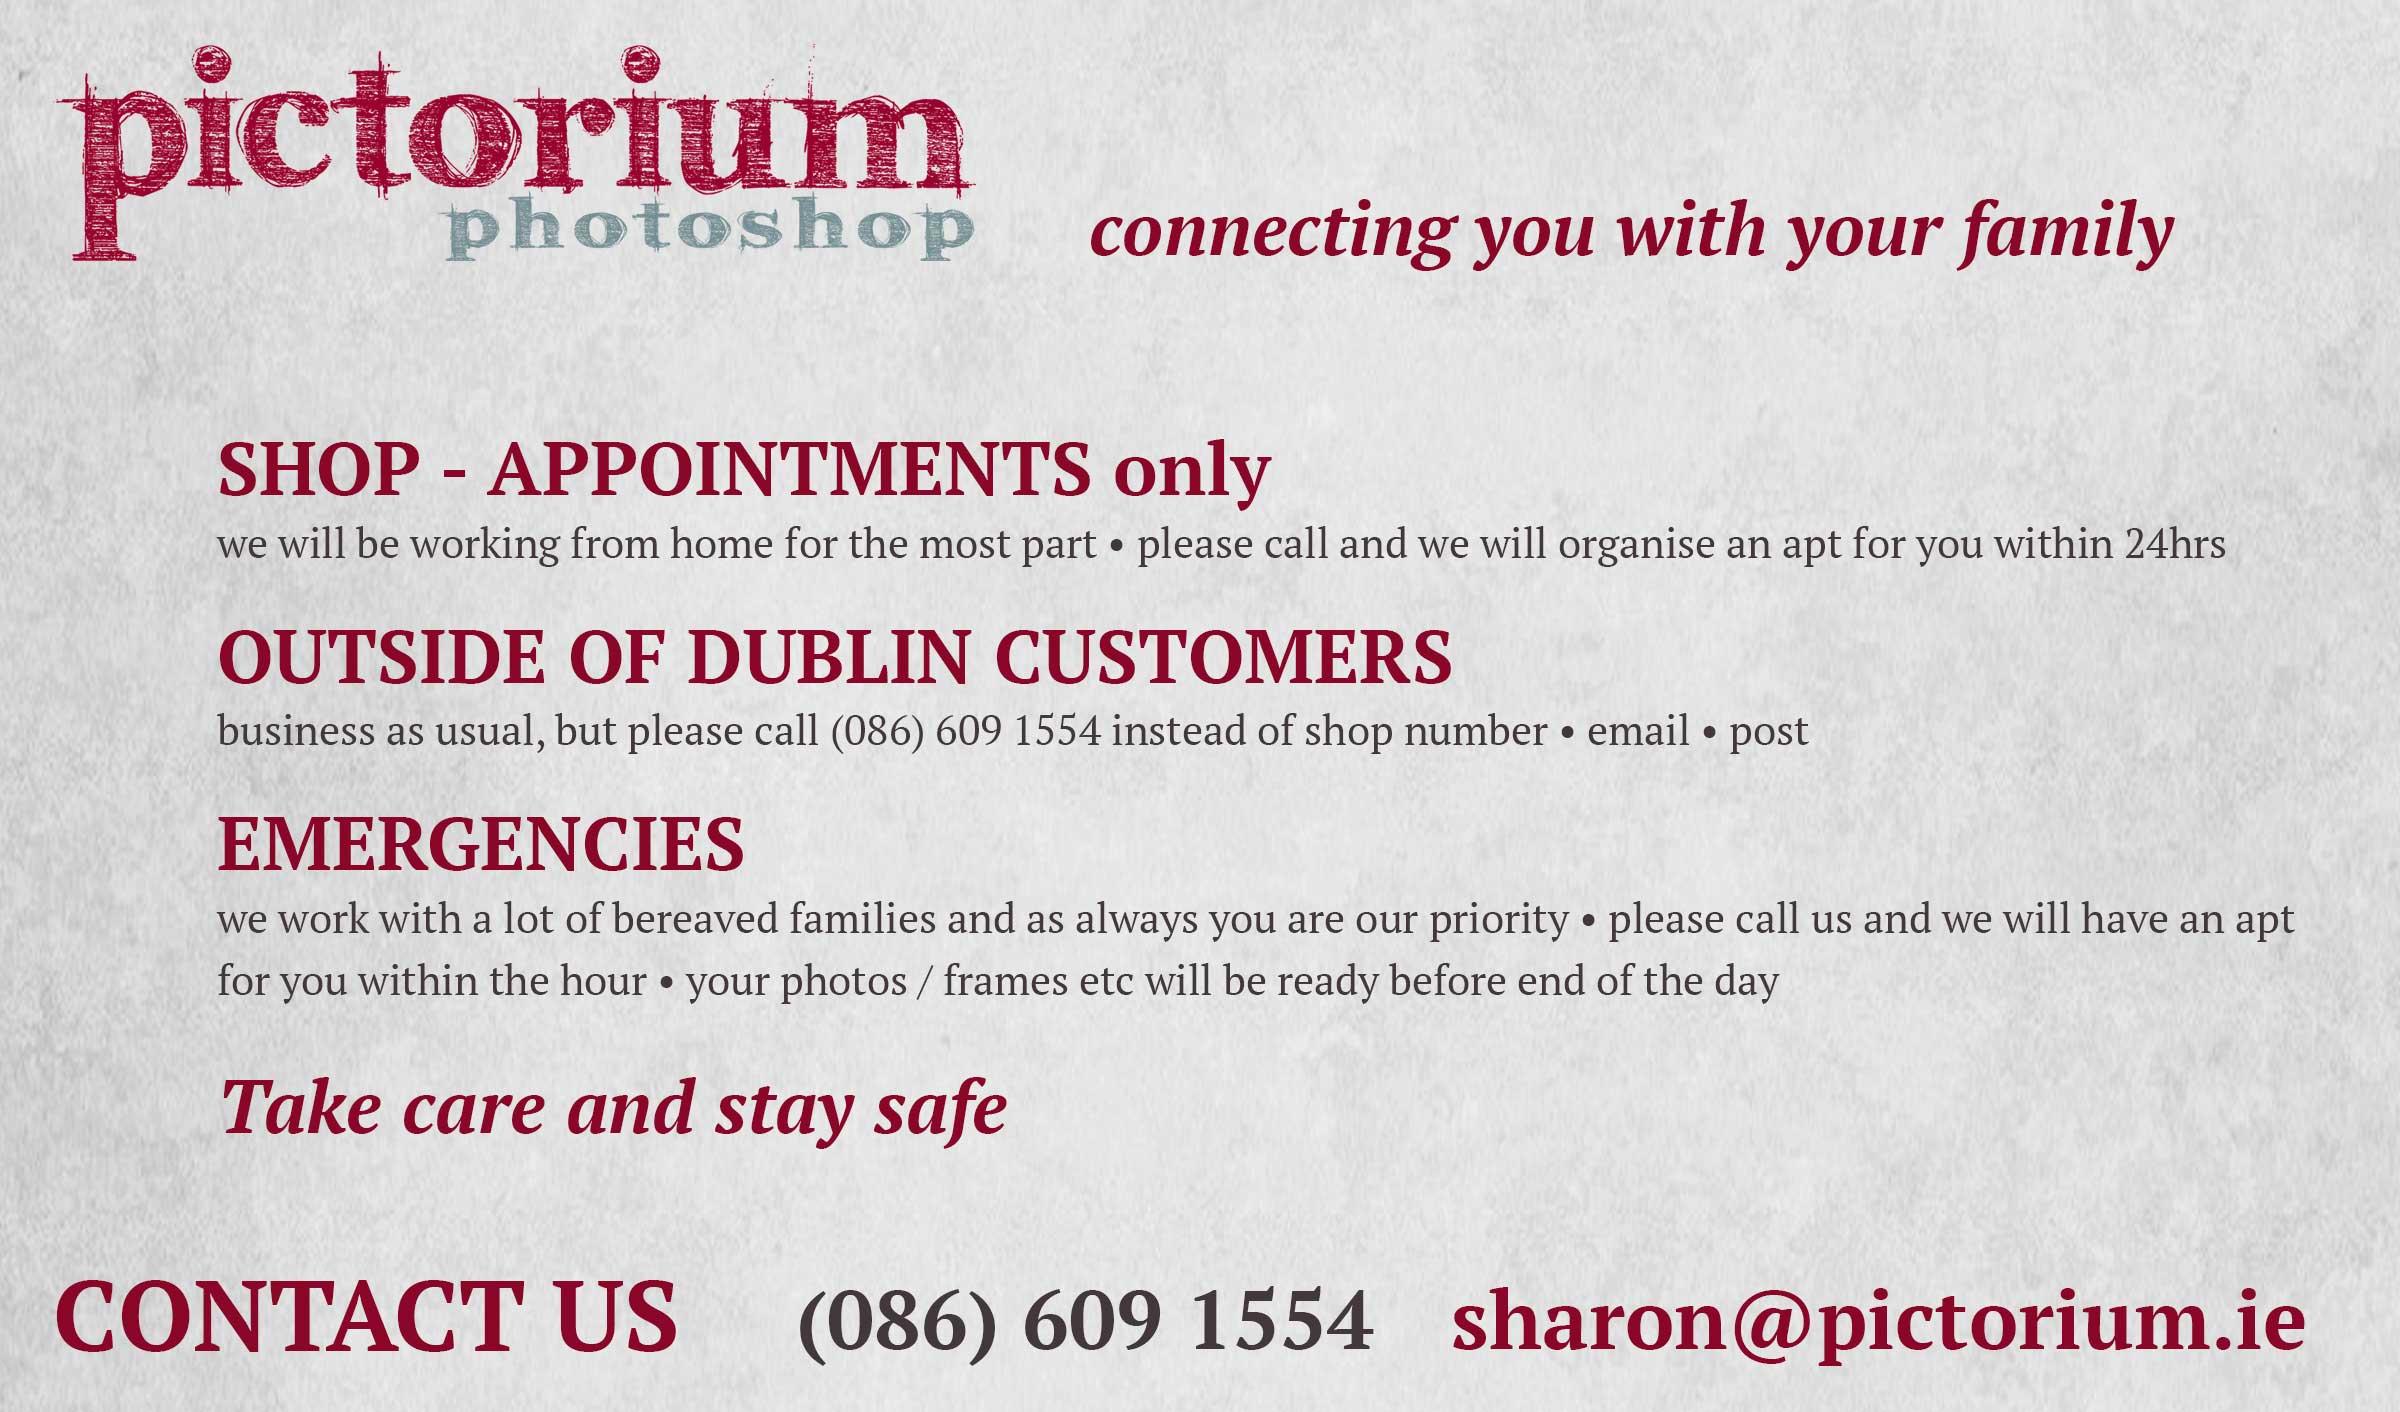 WEB_Pictorium-Photoshop-and-Corona-Virus-and-Facbeook_Photo-Restoration-Sharon-Slowey